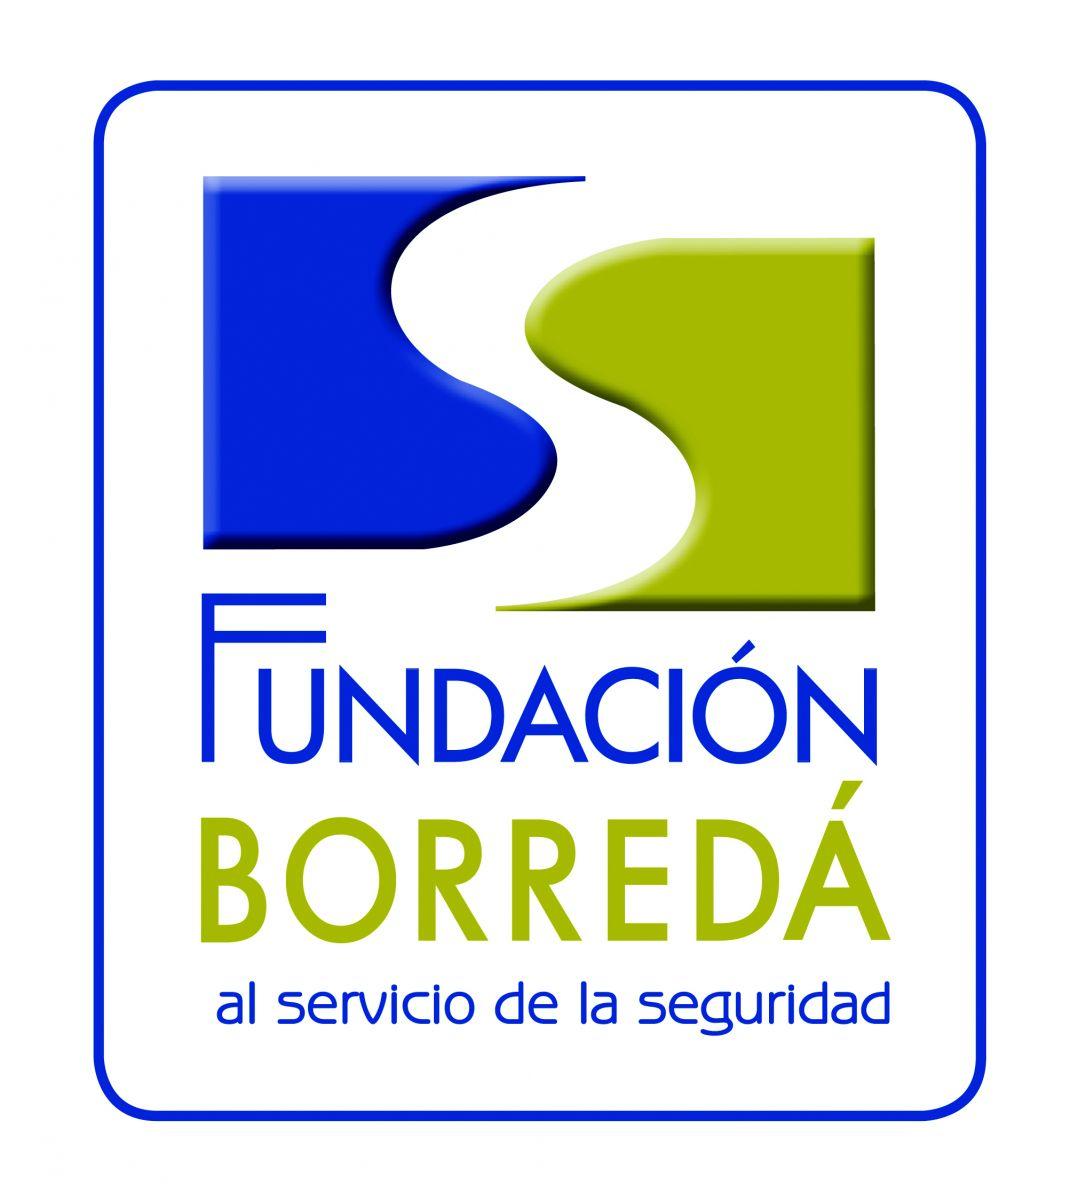 Fundación Borredá